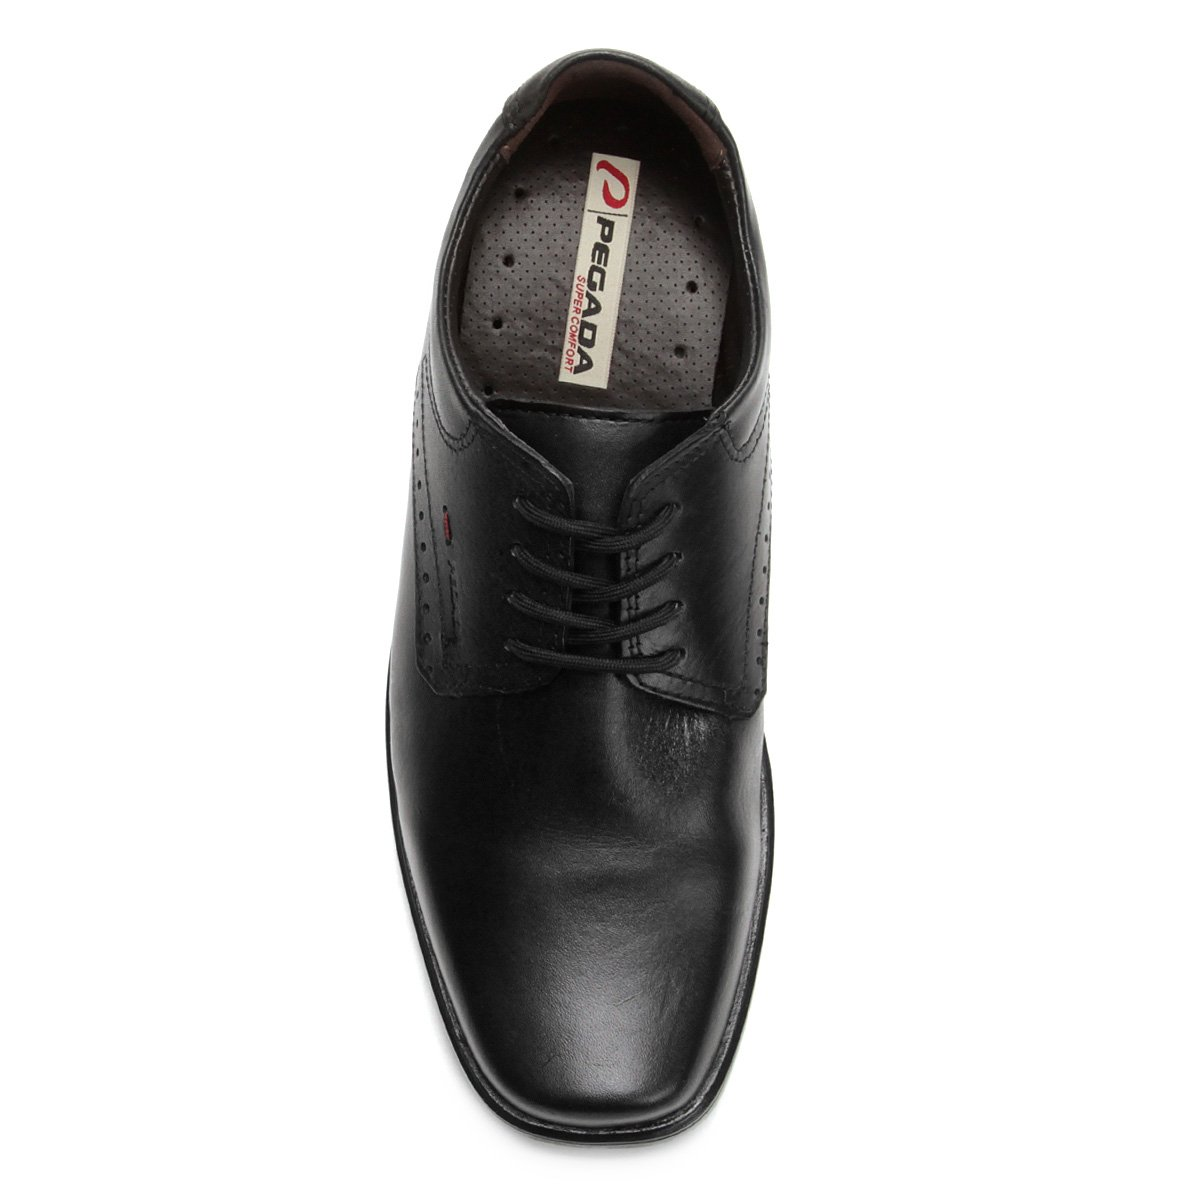 Brogues Preto Brogues Sapato Sapato Social Sapato Social Couro Couro Pegada Preto Pegada 7x4H76nZ